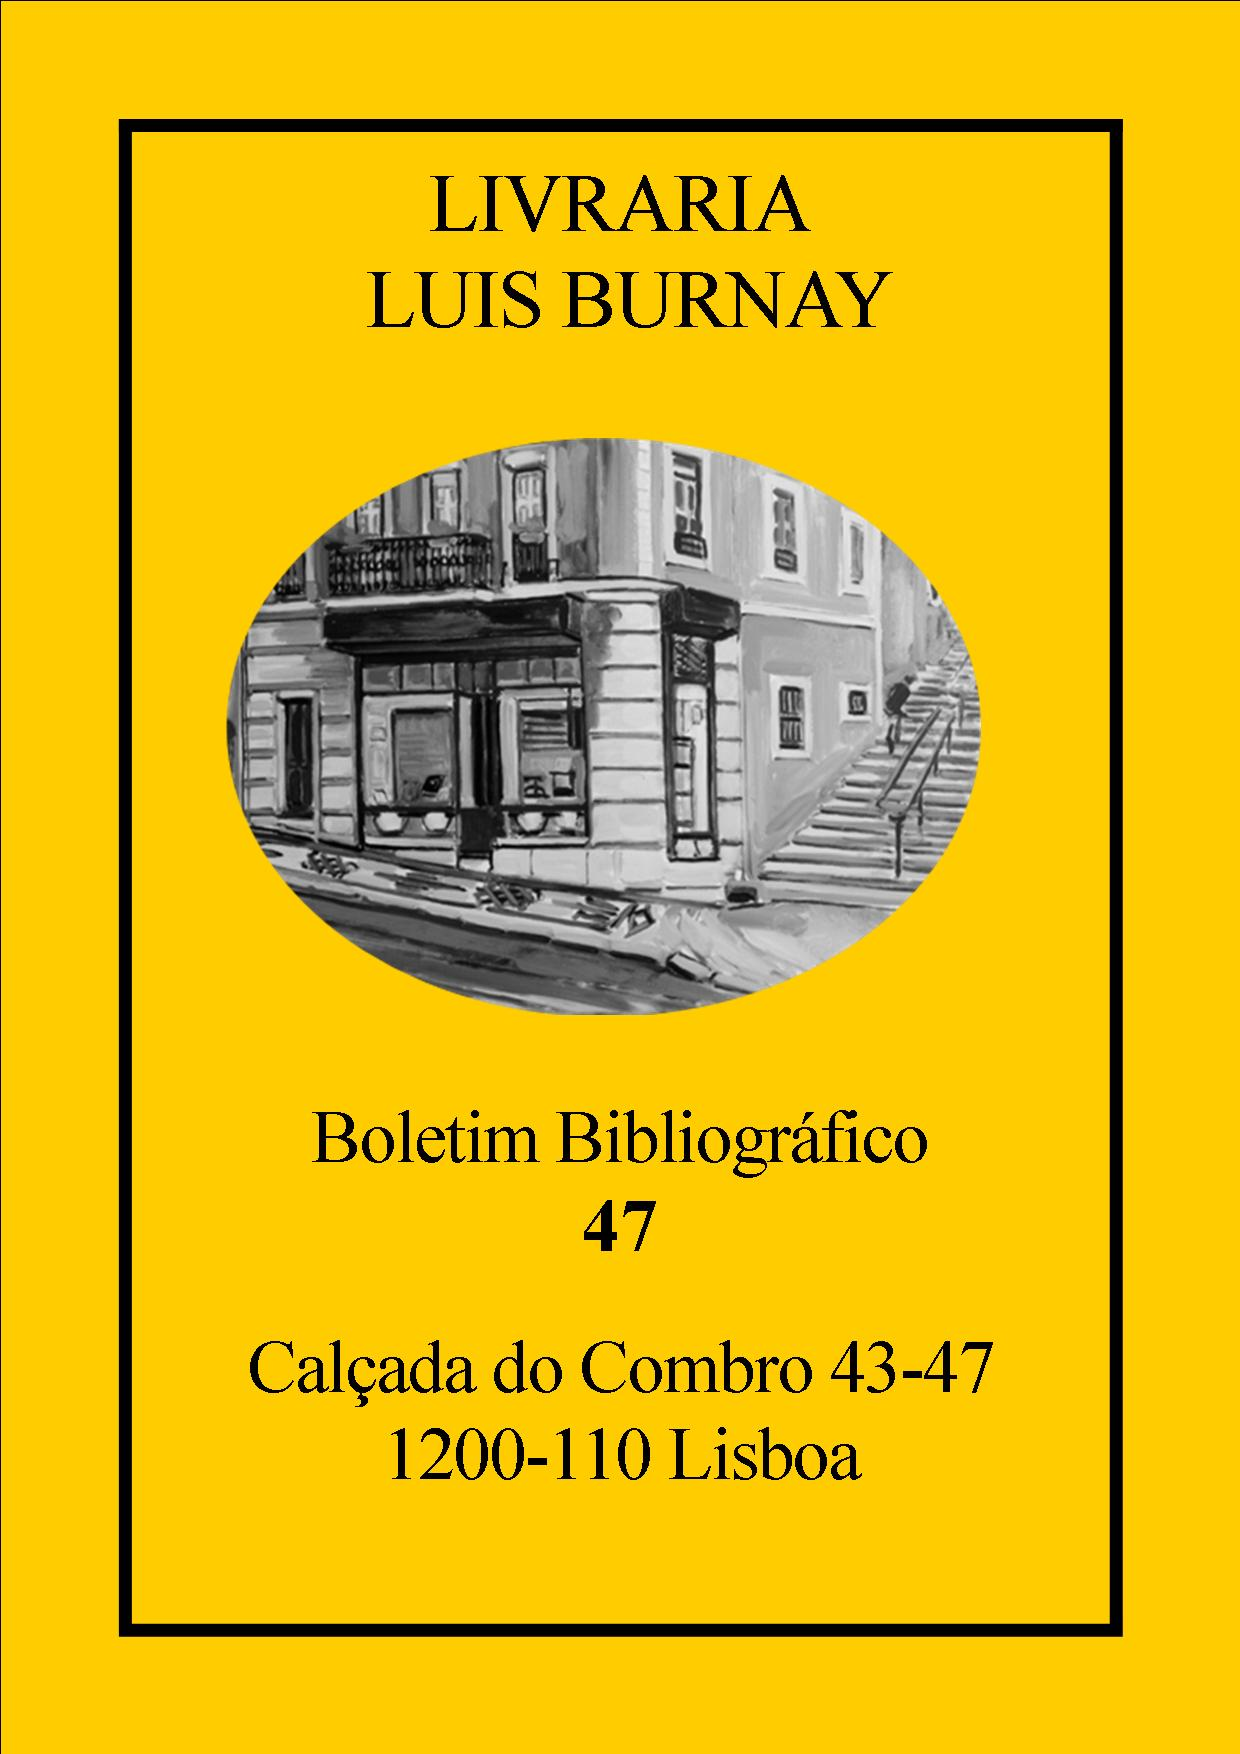 Boletim Bibliográfico nº 47